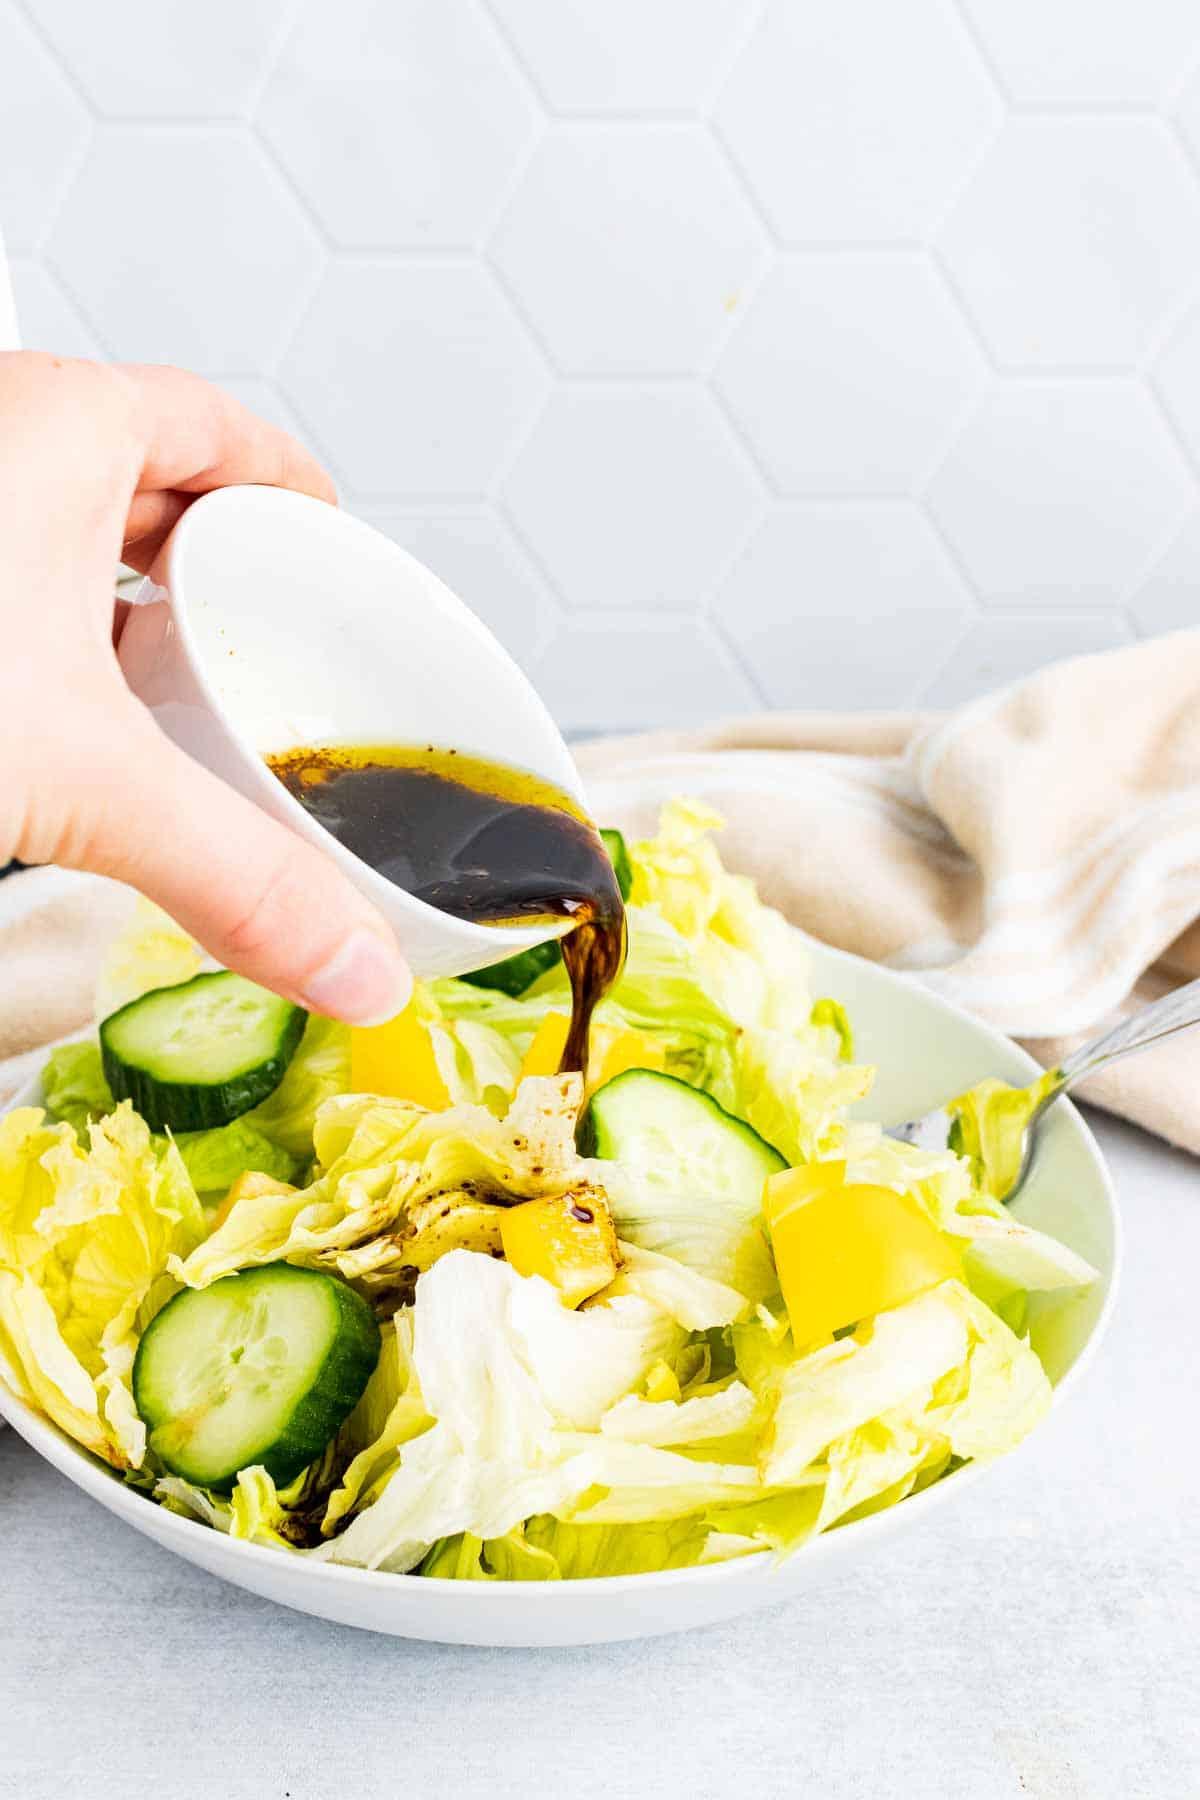 Hand pouring balsamic vinaigrette over a salad